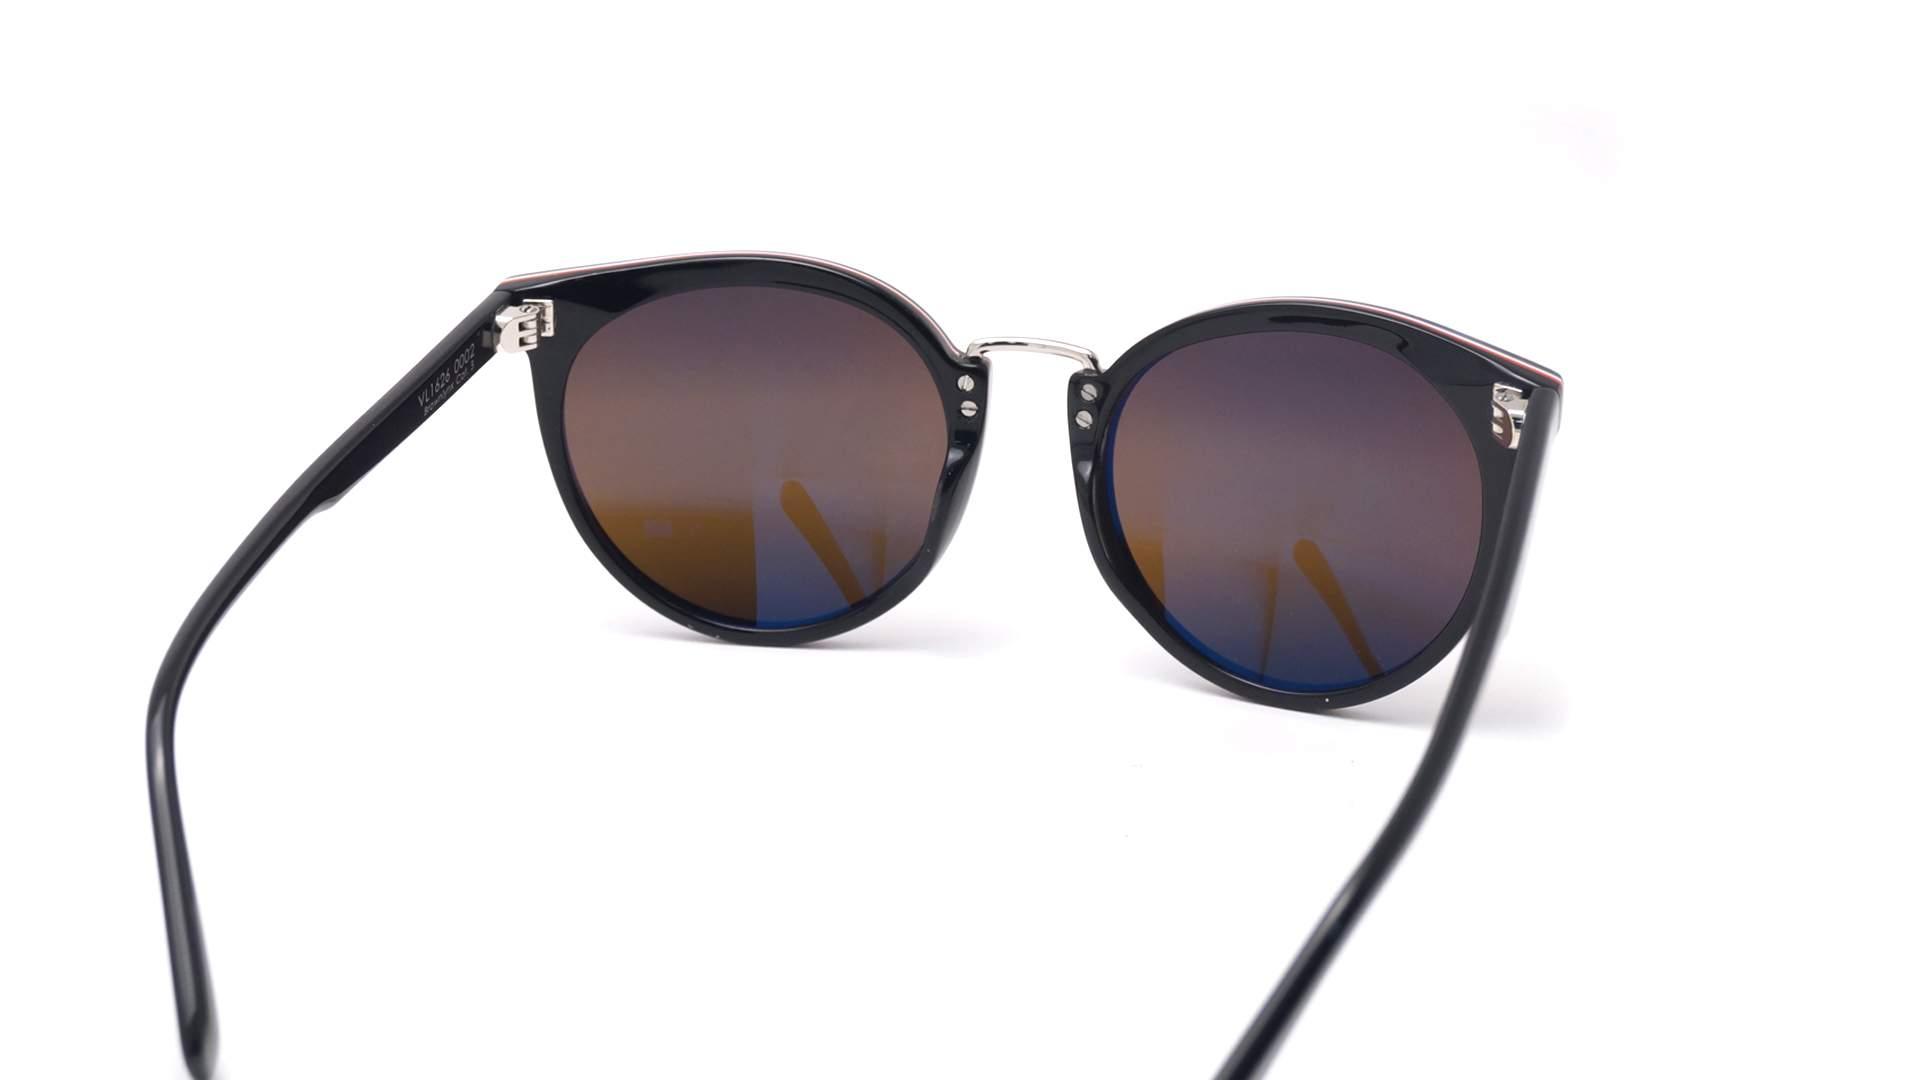 680618085a5f Sunglasses Vuarnet Cable Car Cat eye Tortoise Brownlynx VL1626 0002 52-11  Small Gradient Mirror